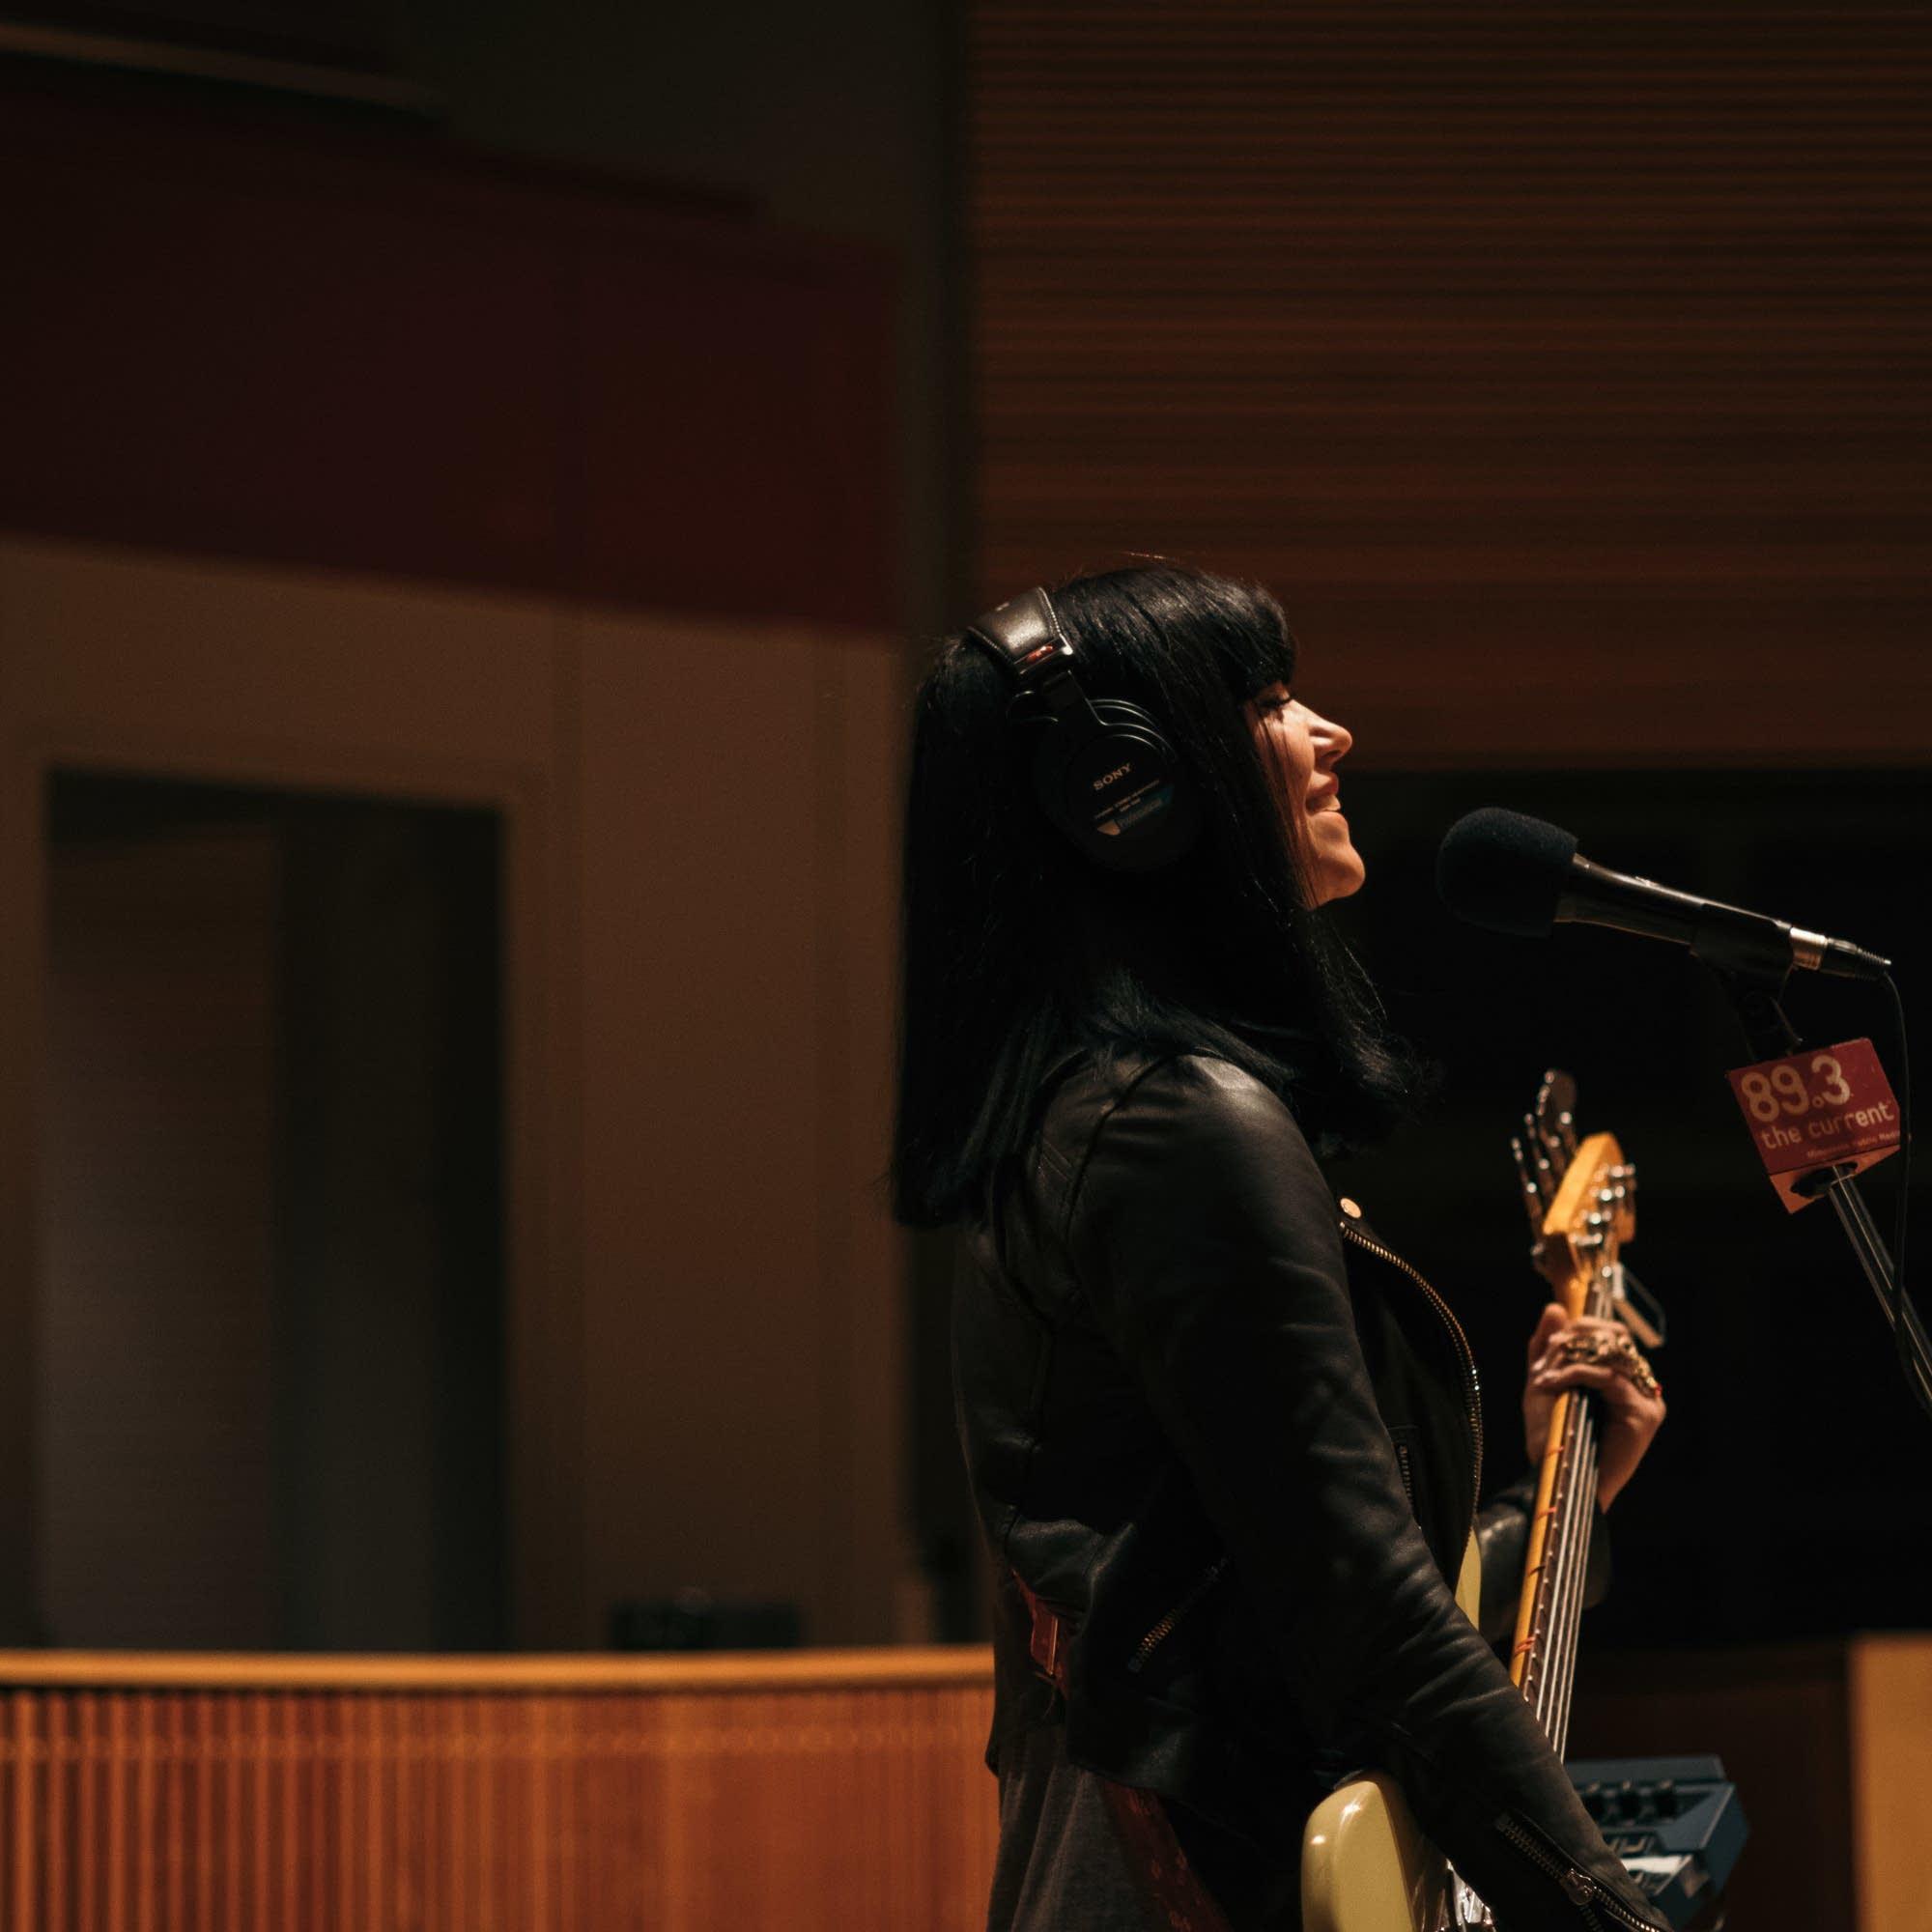 Khruangbin perform in The Current studio